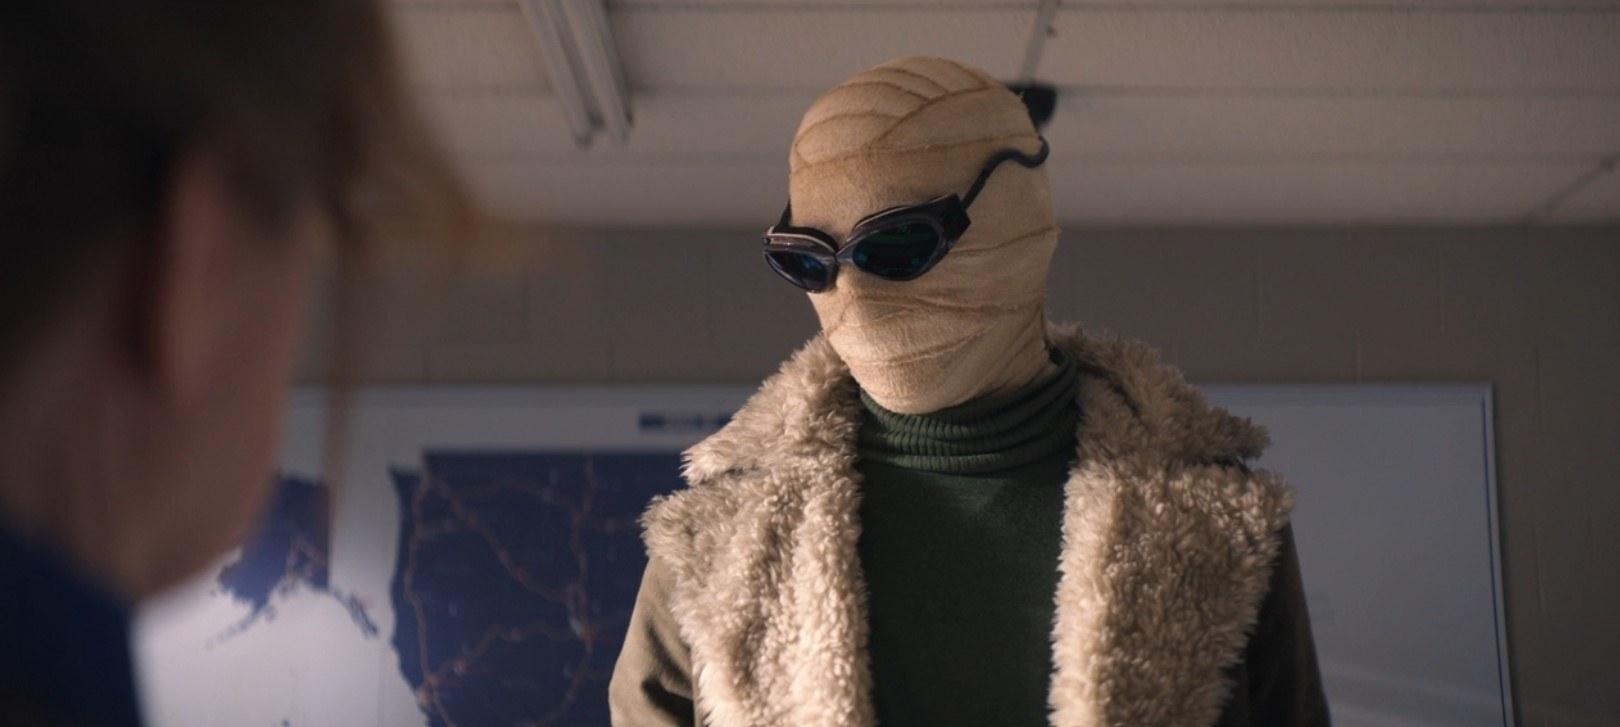 Matthew Zuk as the Negative Man